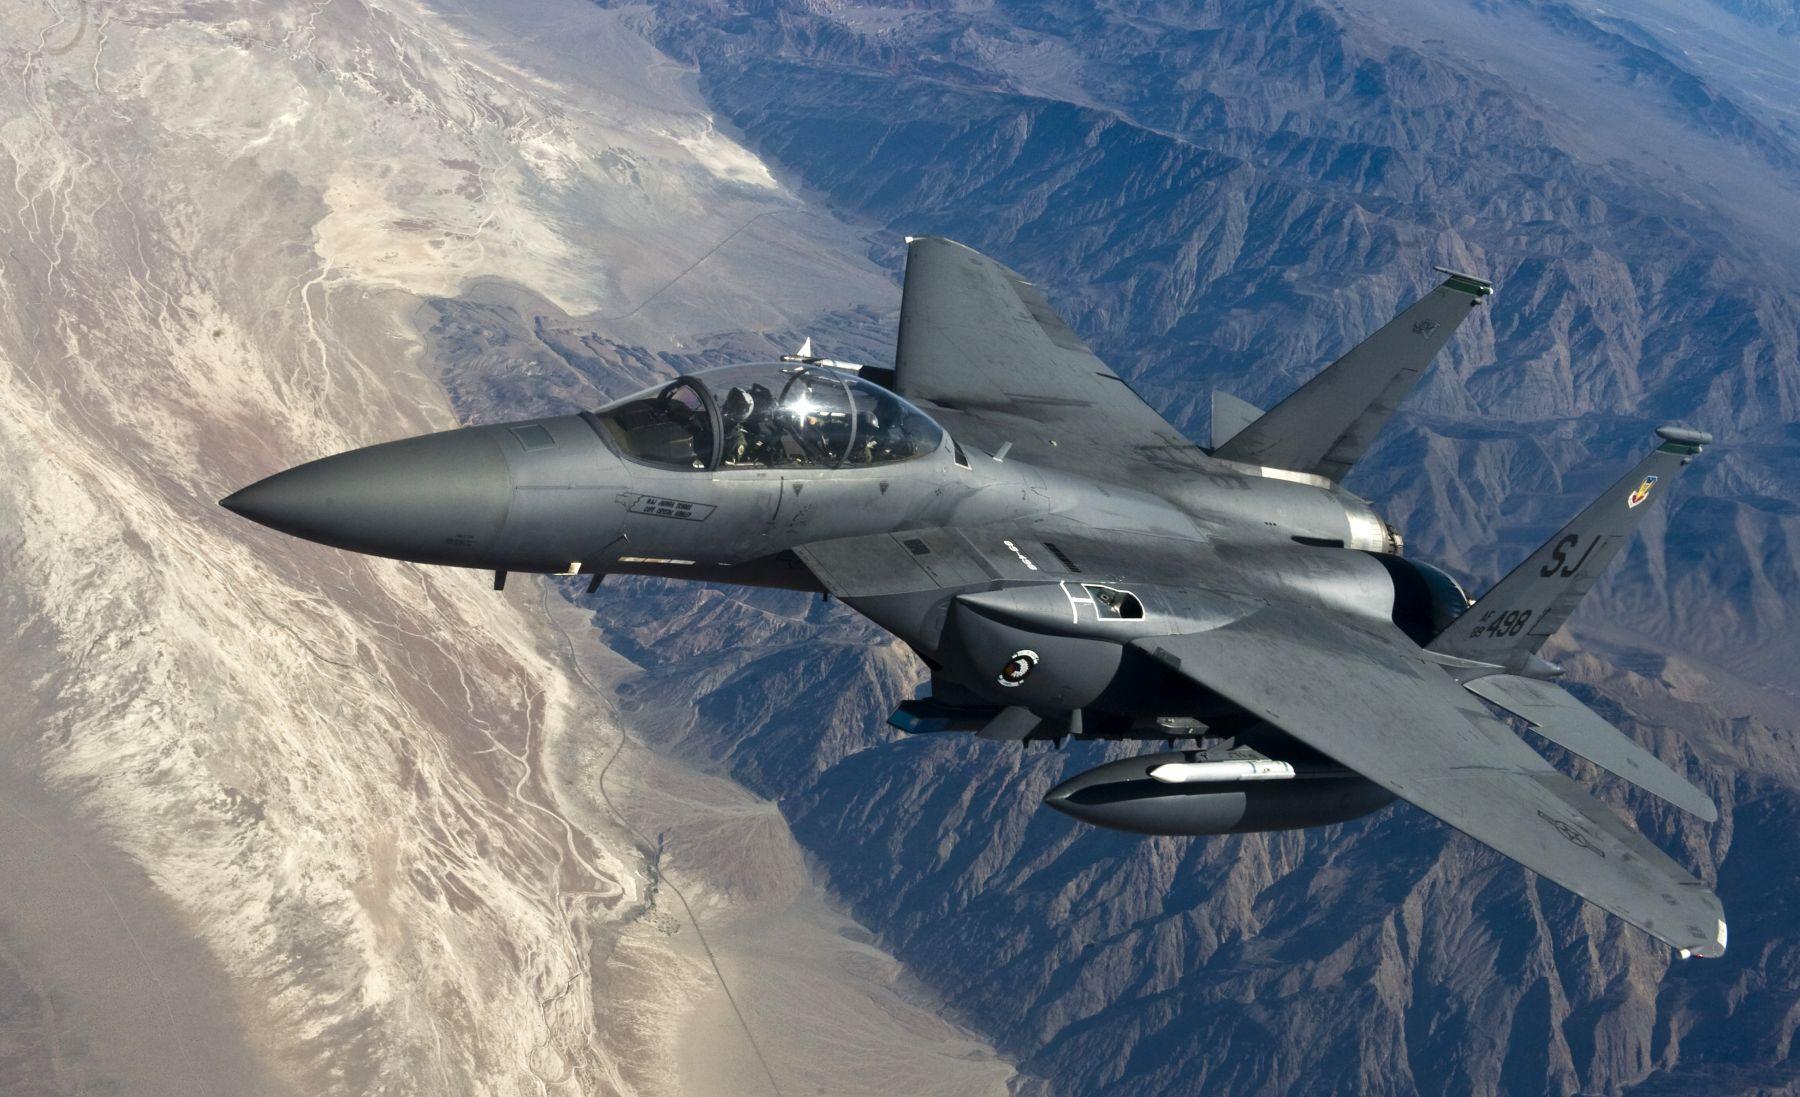 Amerykański F-15E Strike Eagle z 335. Eskadry Myśliwskiej nad stanem Nevada (fot. Senior Airman Brett Clashman / US Air Force)